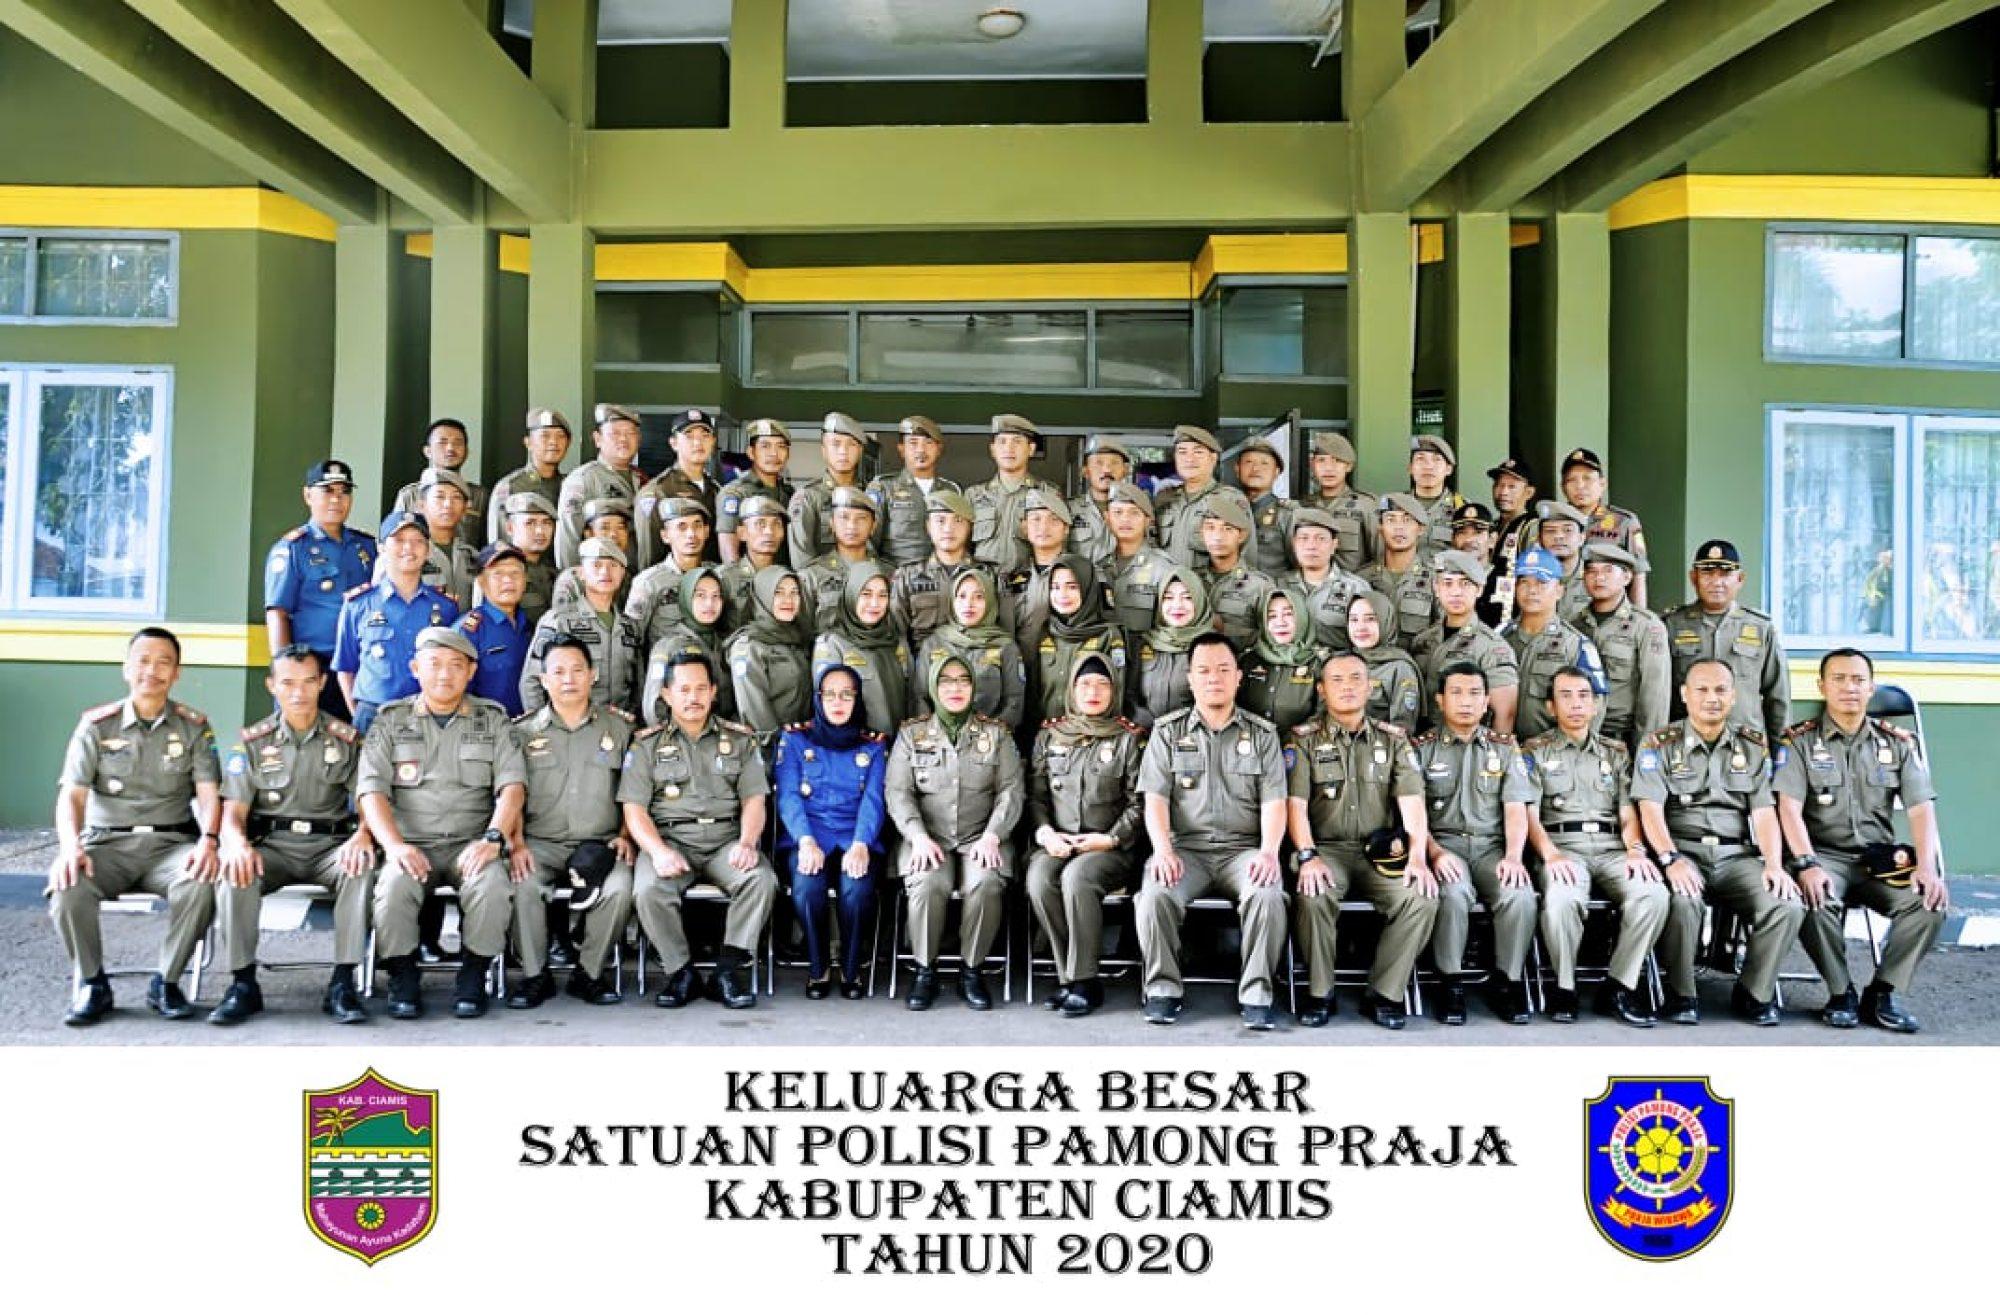 Satuan Polisi Pamong Praja Kabupaten Ciamis